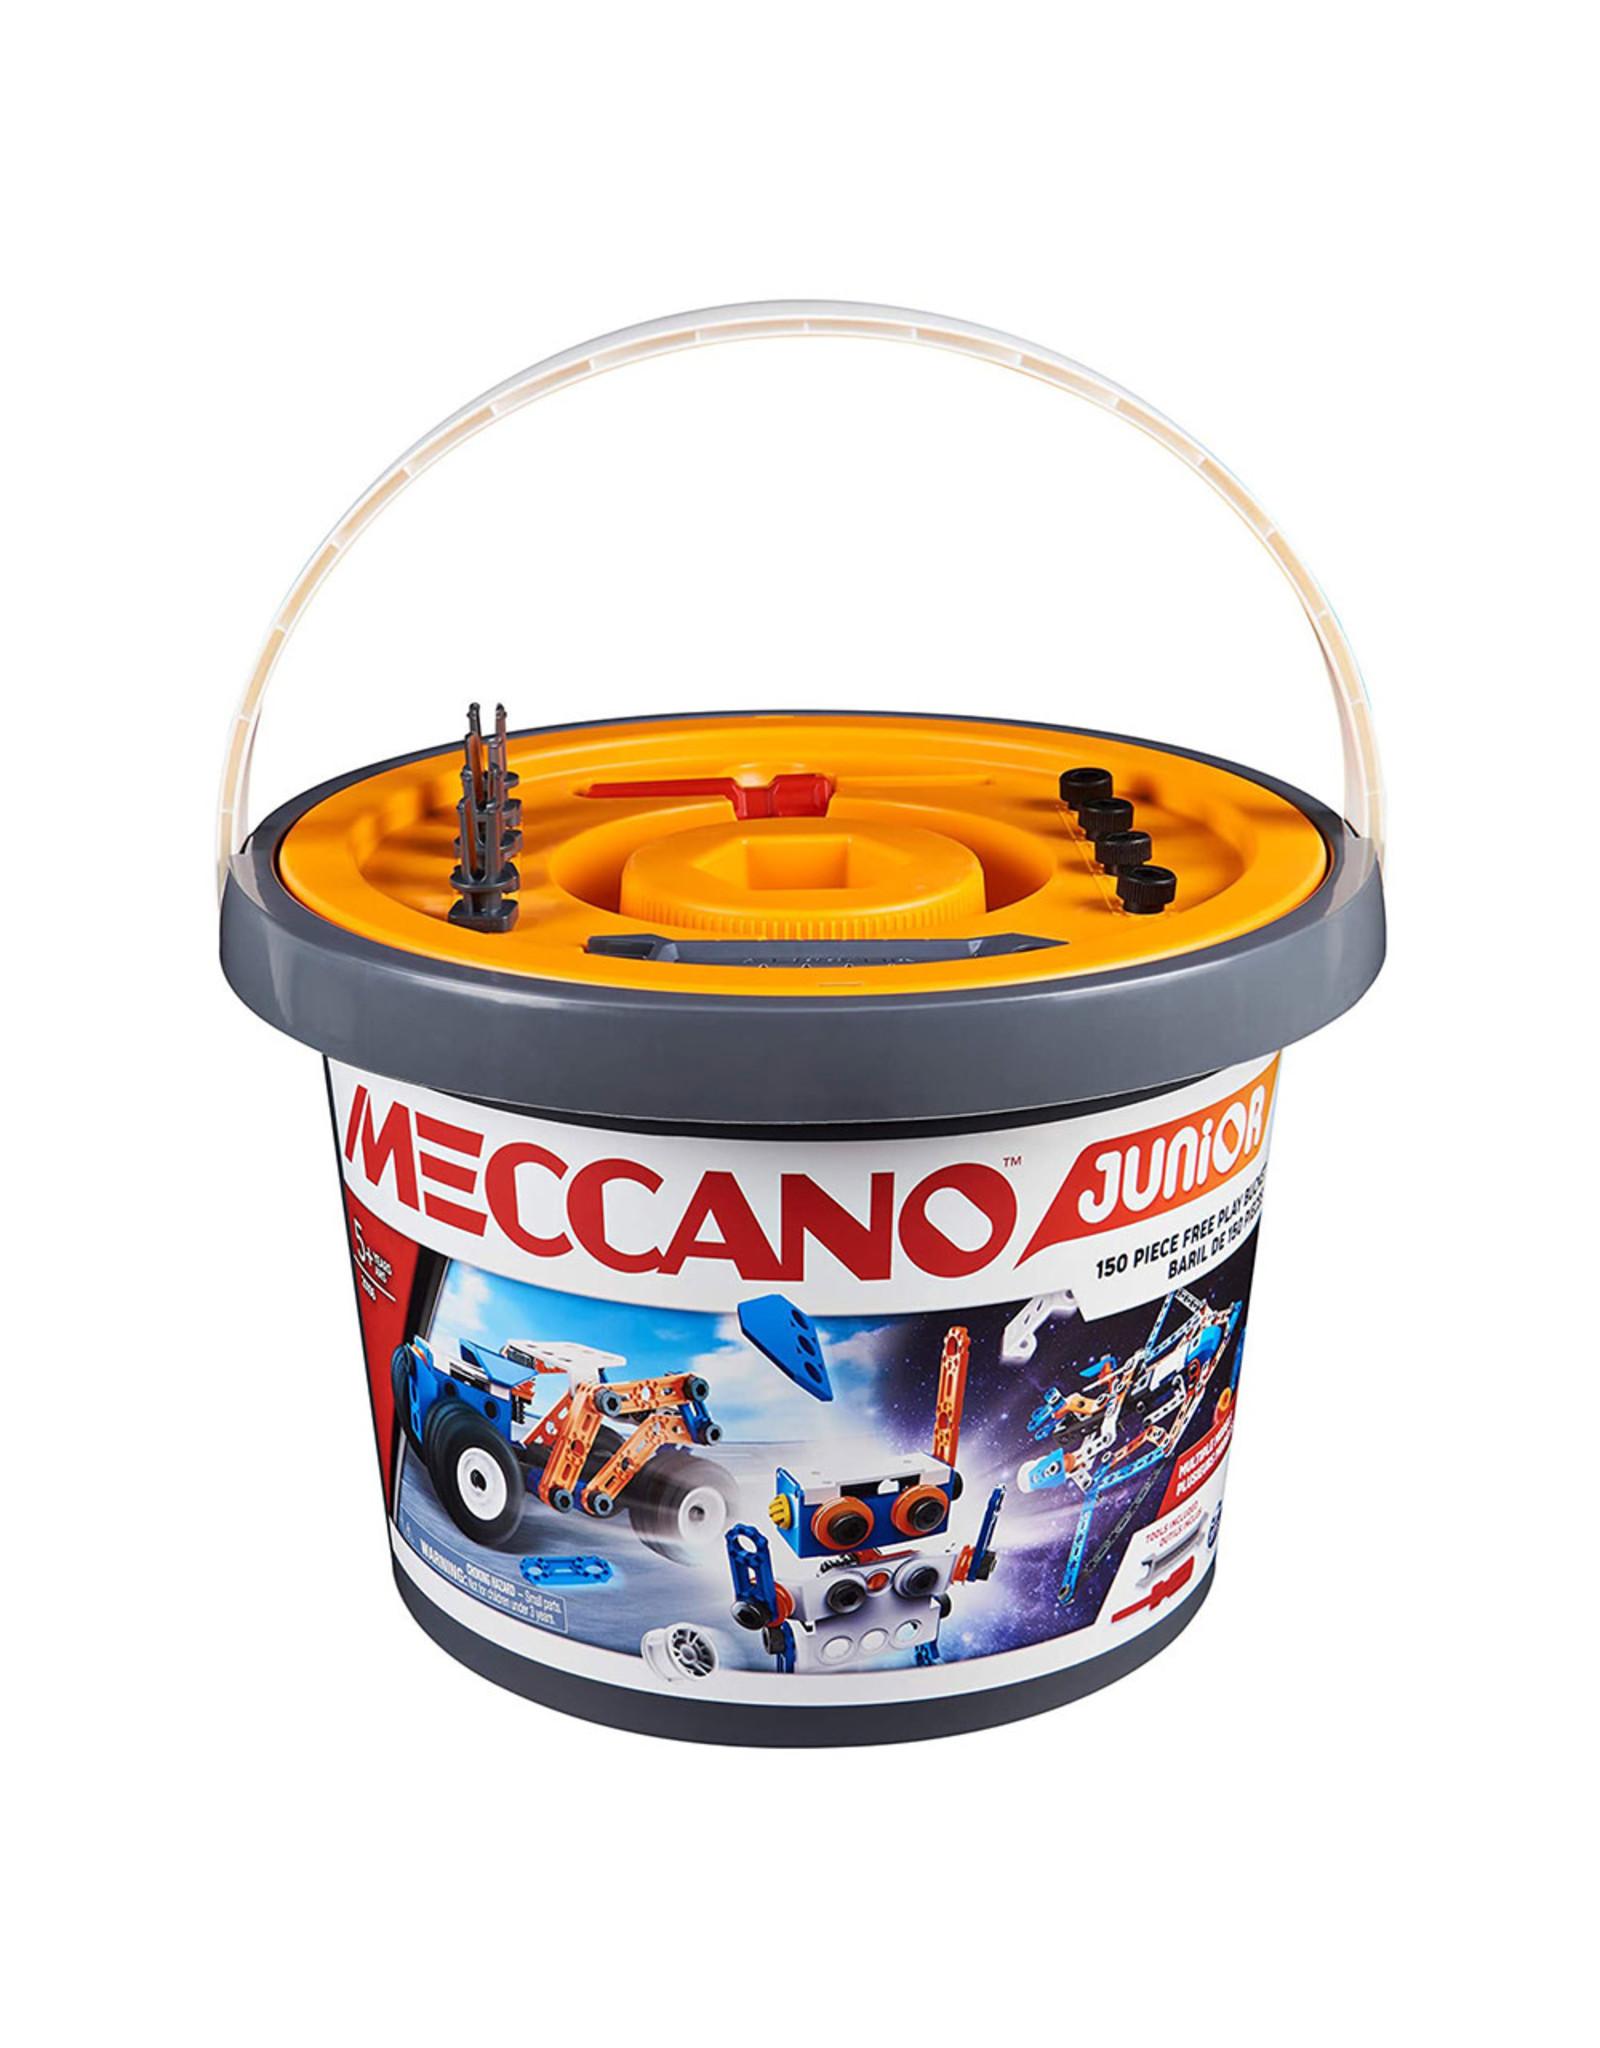 Meccano Meccano Junior Free-Play Bucket 150pc